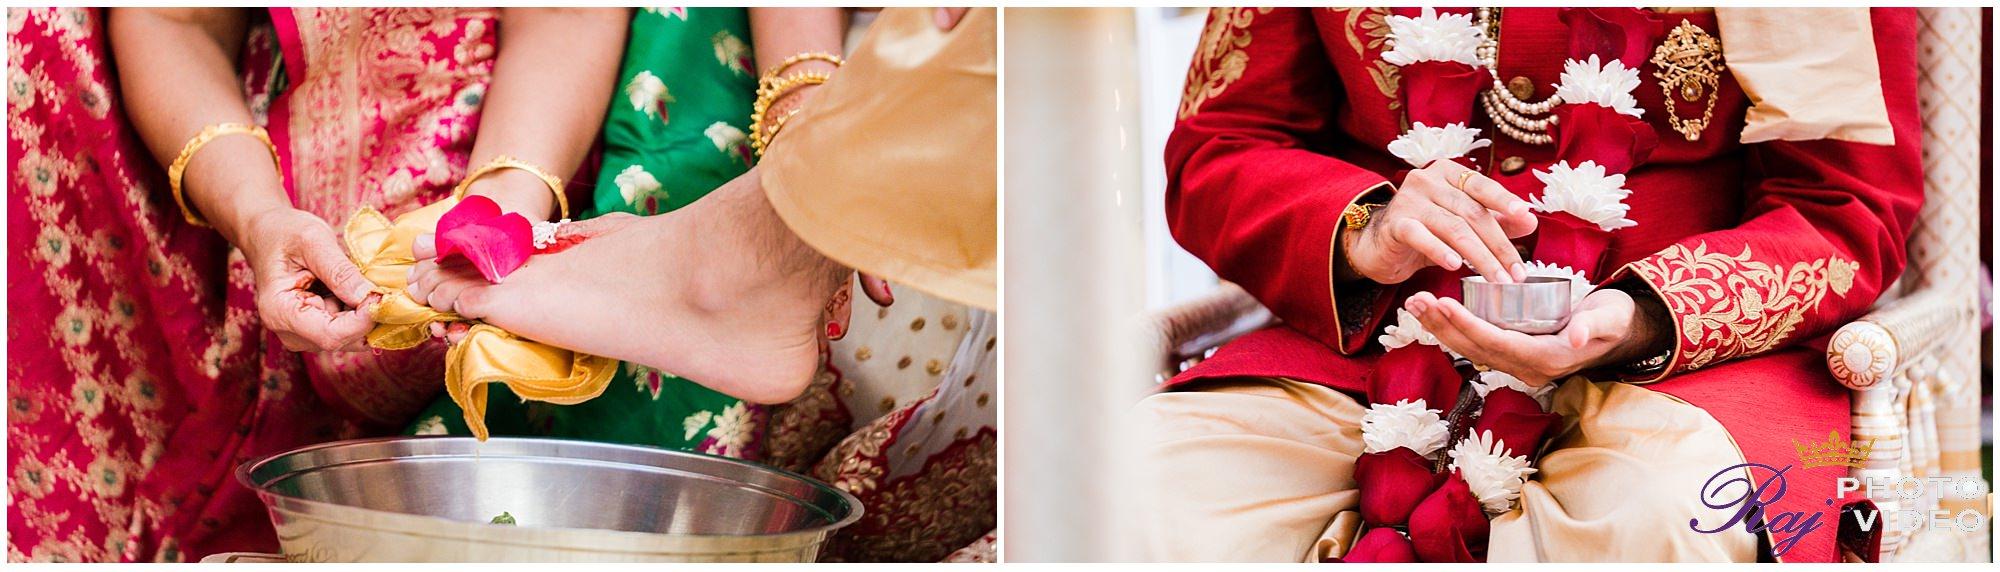 Founders-Inn-and-Spa-Virginia-Beach-VA-Indian-Wedding-Harini-Vivek-52.jpg